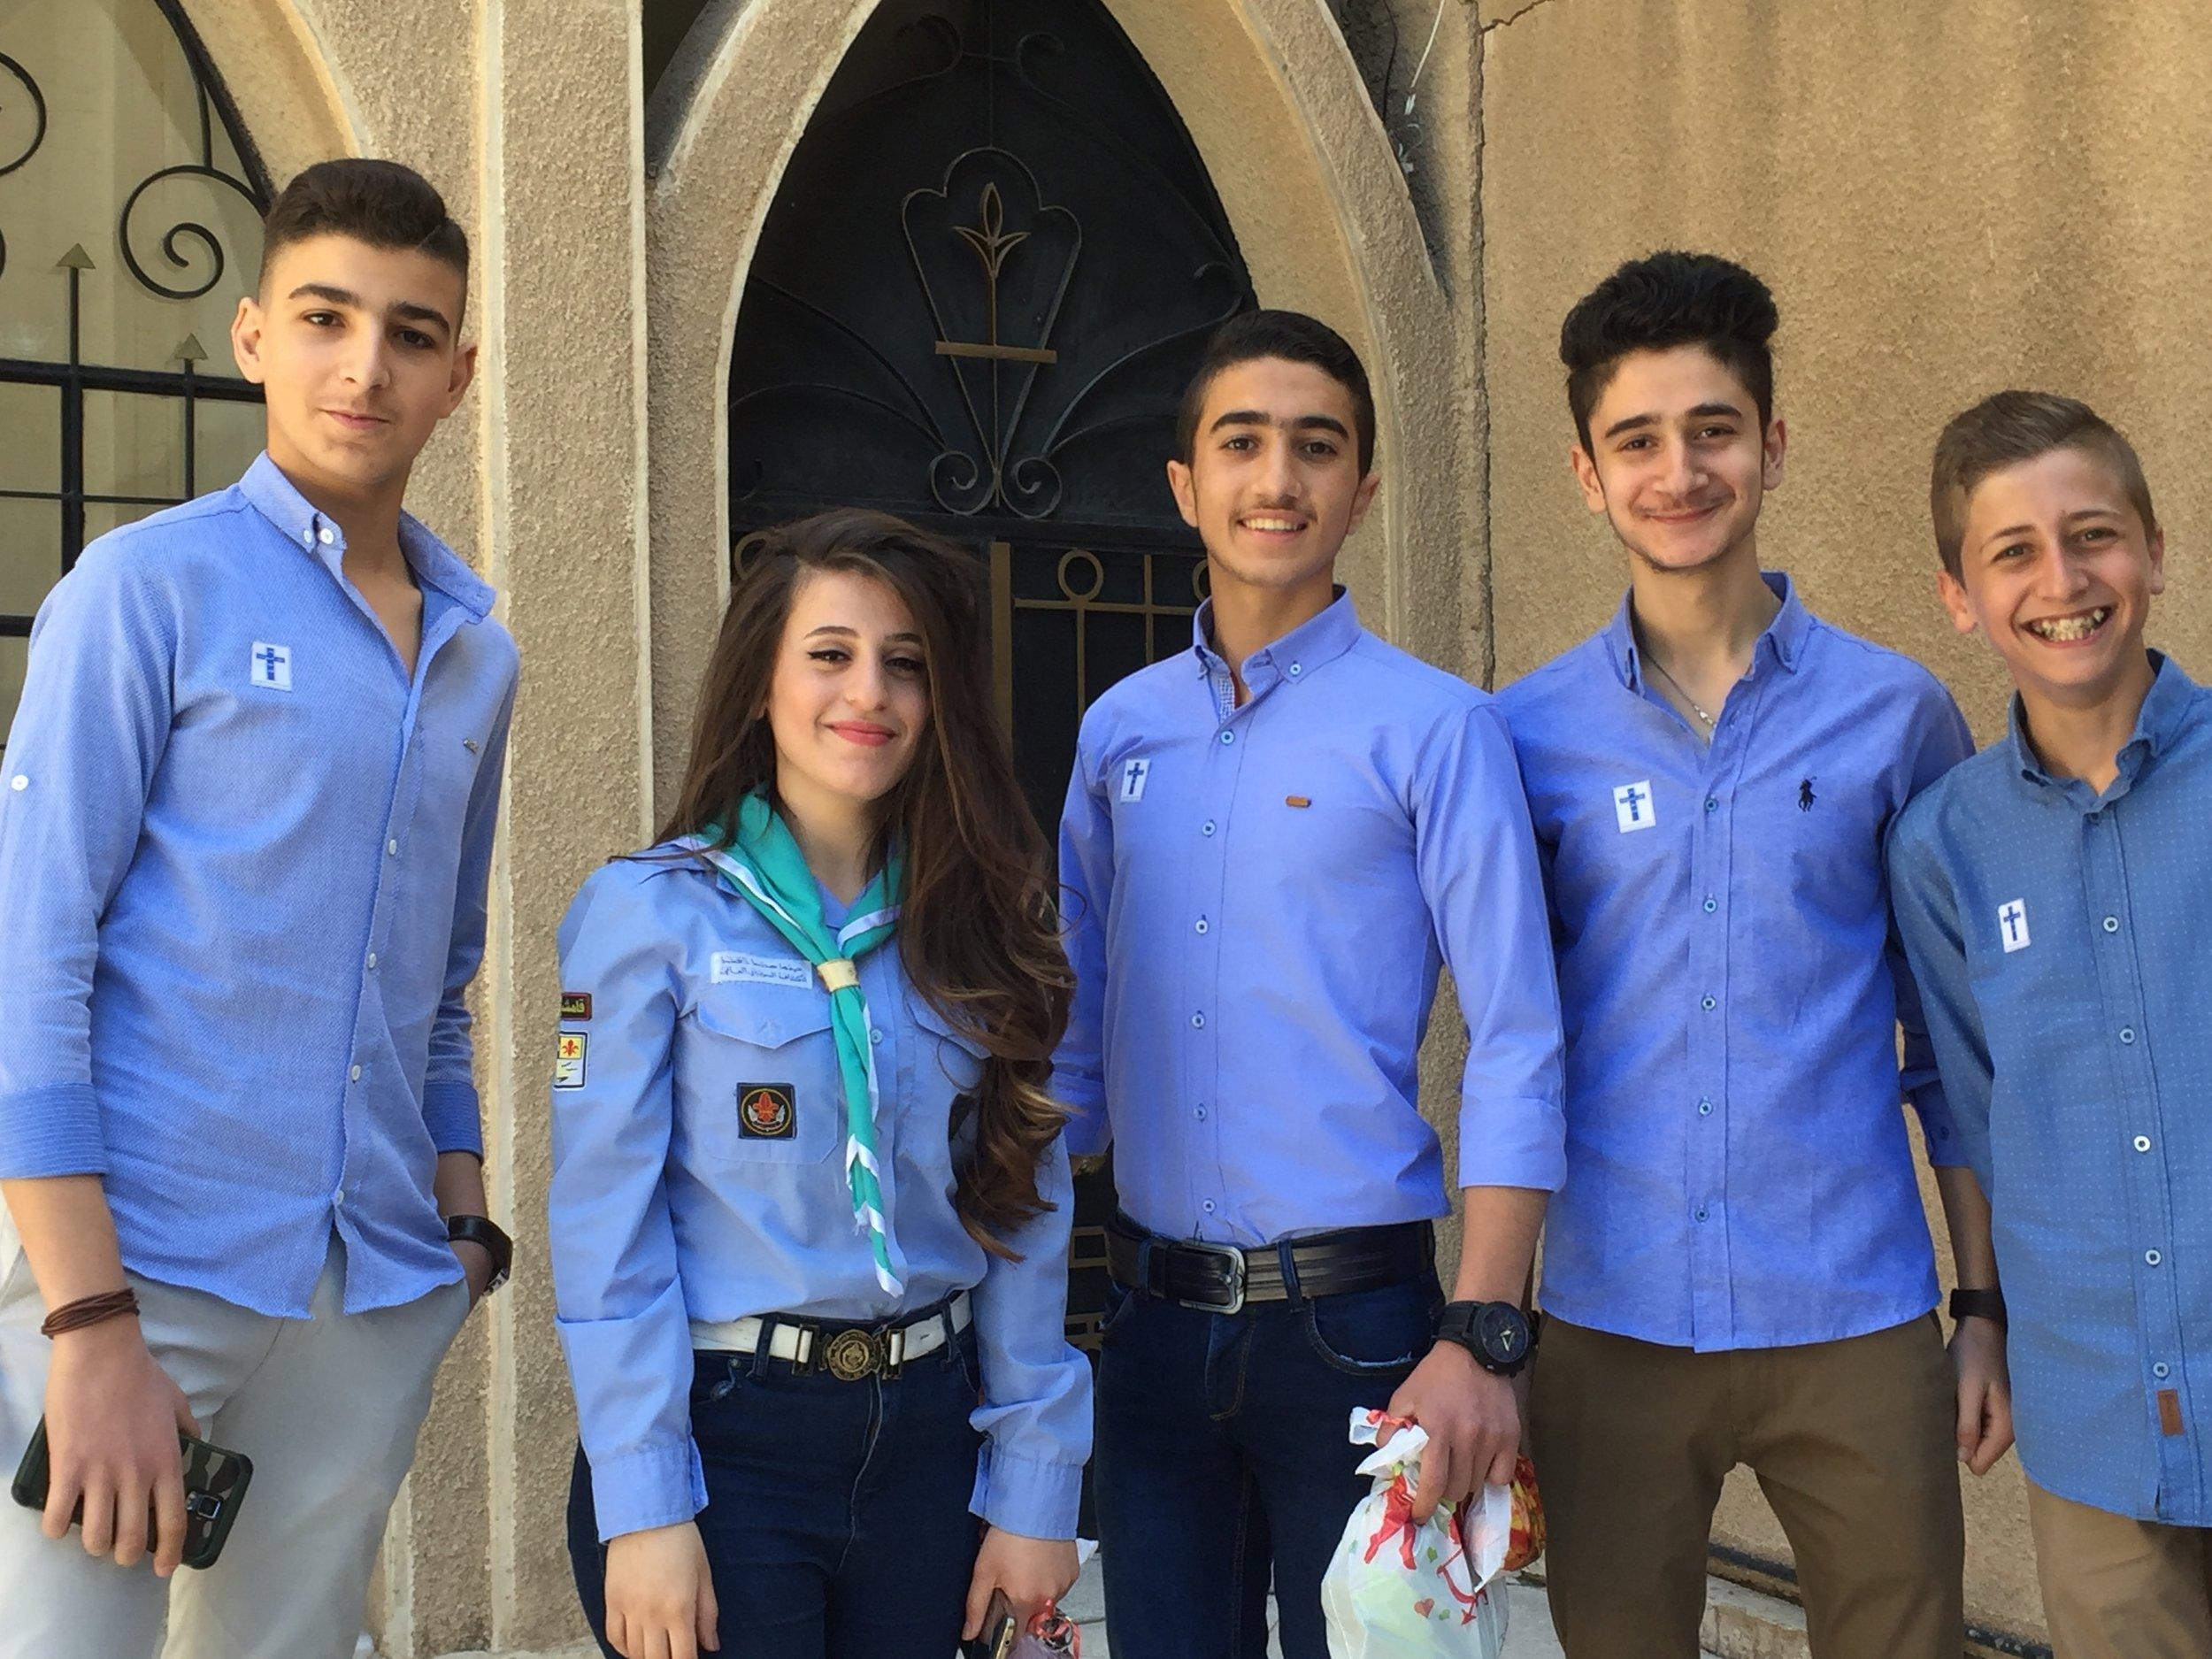 At Qamishli Church, the future looks bright.